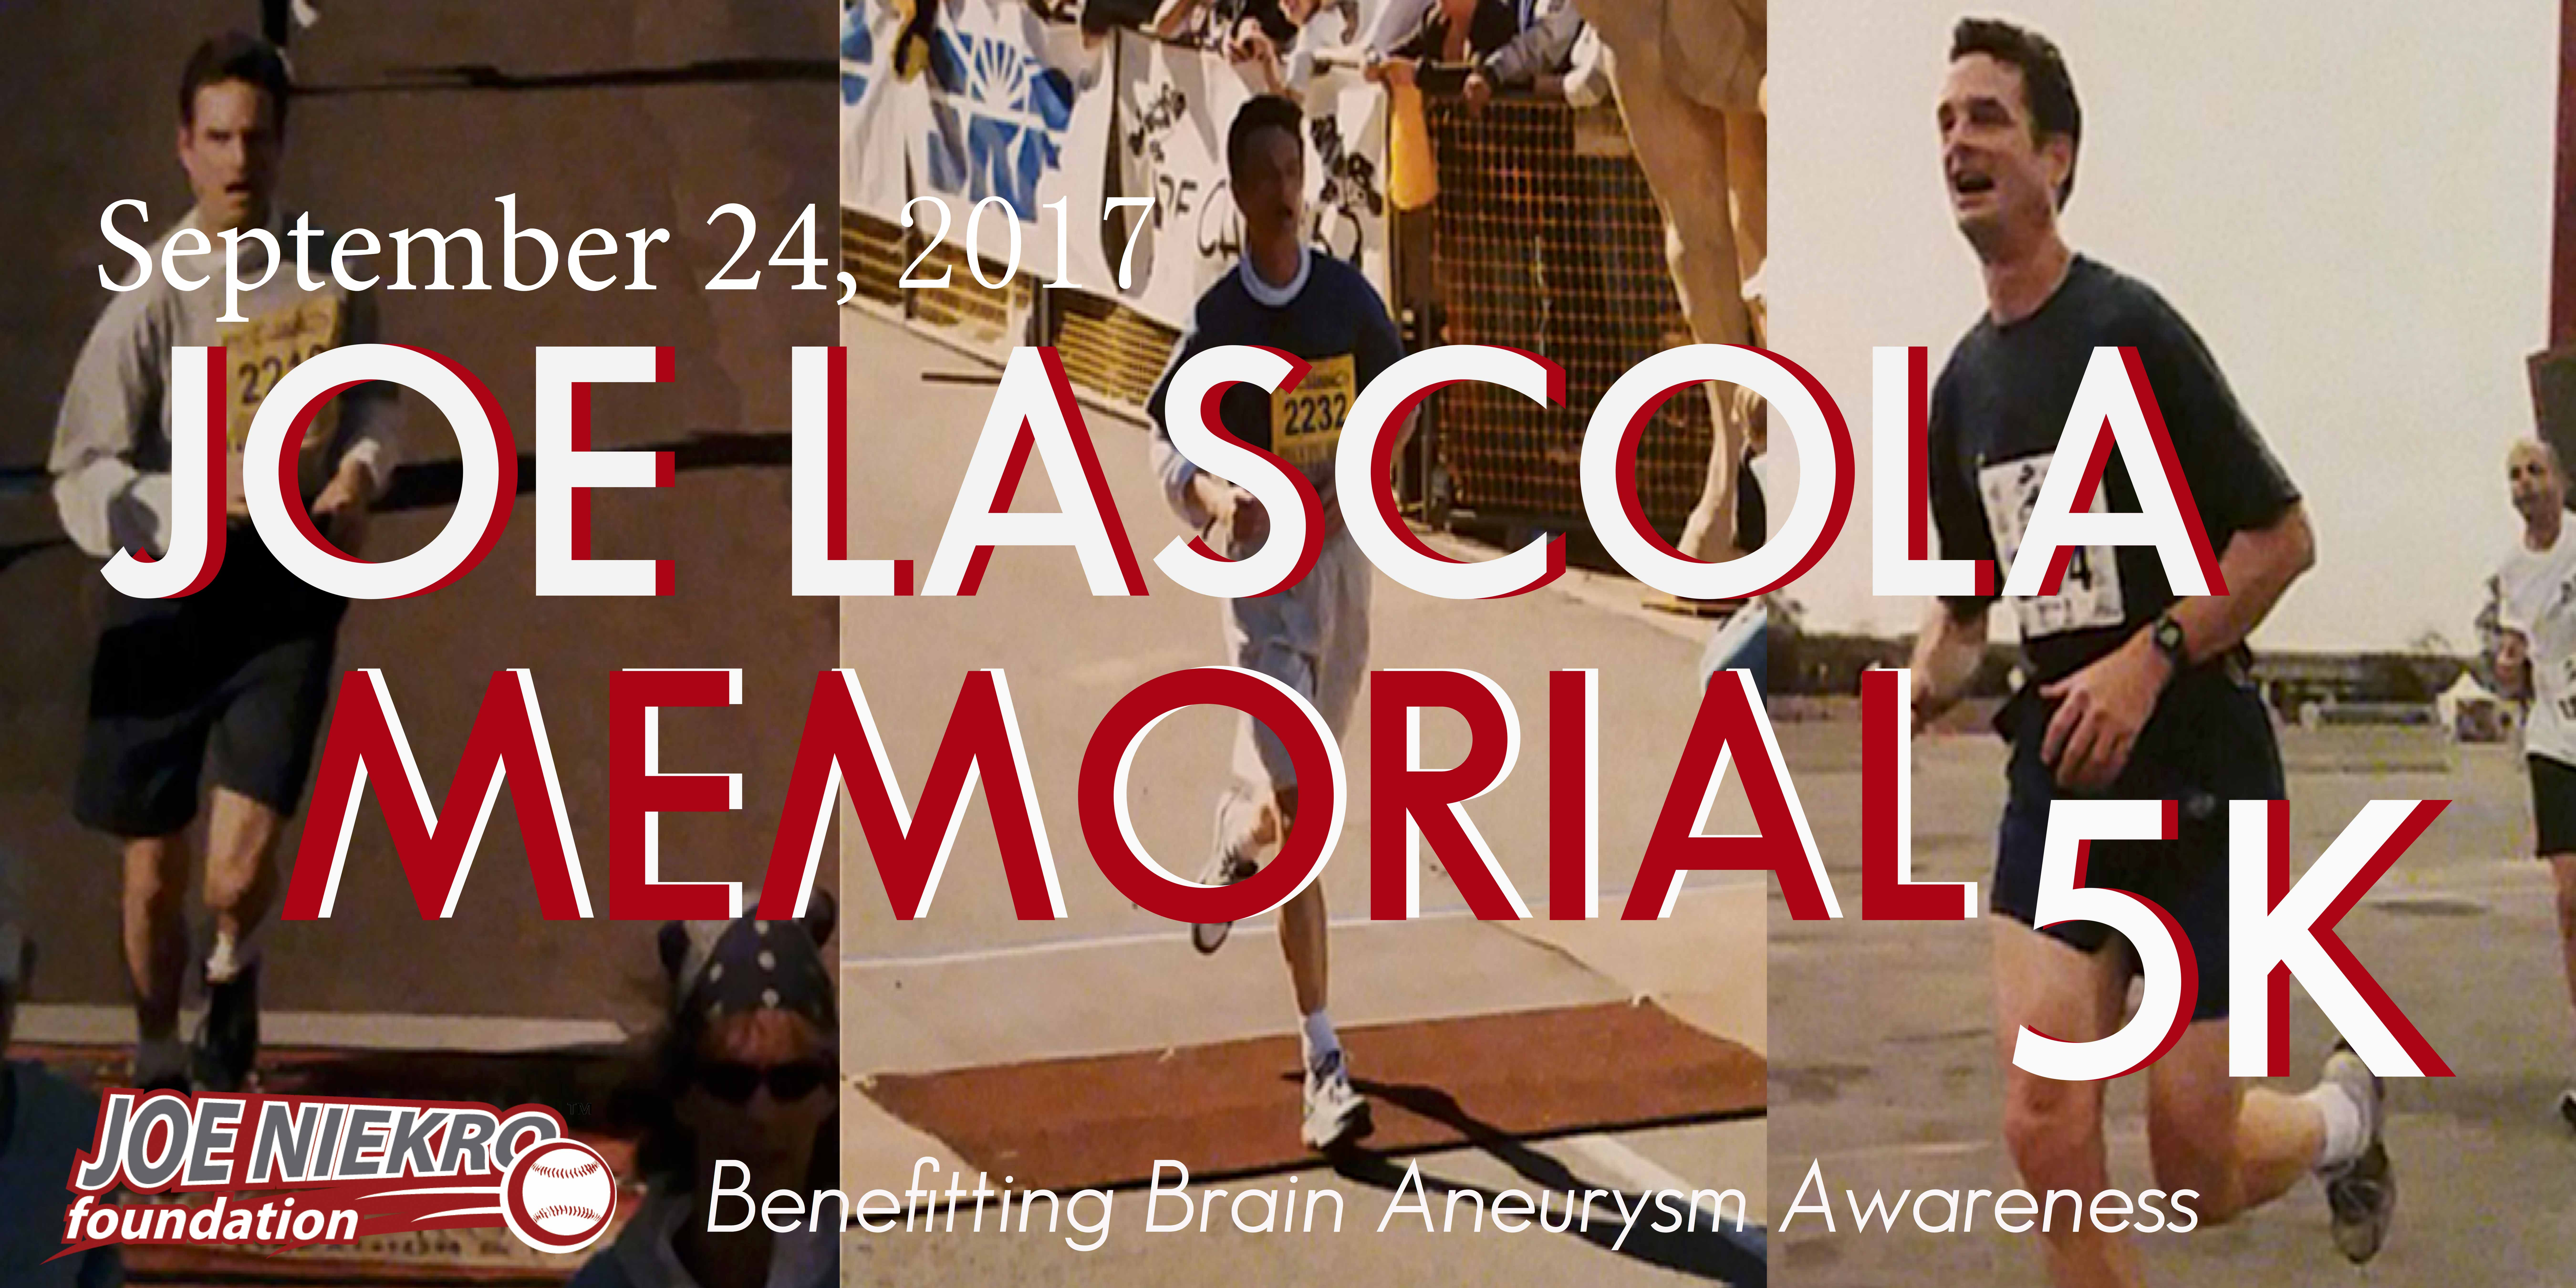 http://www.joeniekrofoundation.com/events/past-events/pastevents2017/joe-lascola-memorial-walk/attachment/lascola-2017-walk-banner-3/